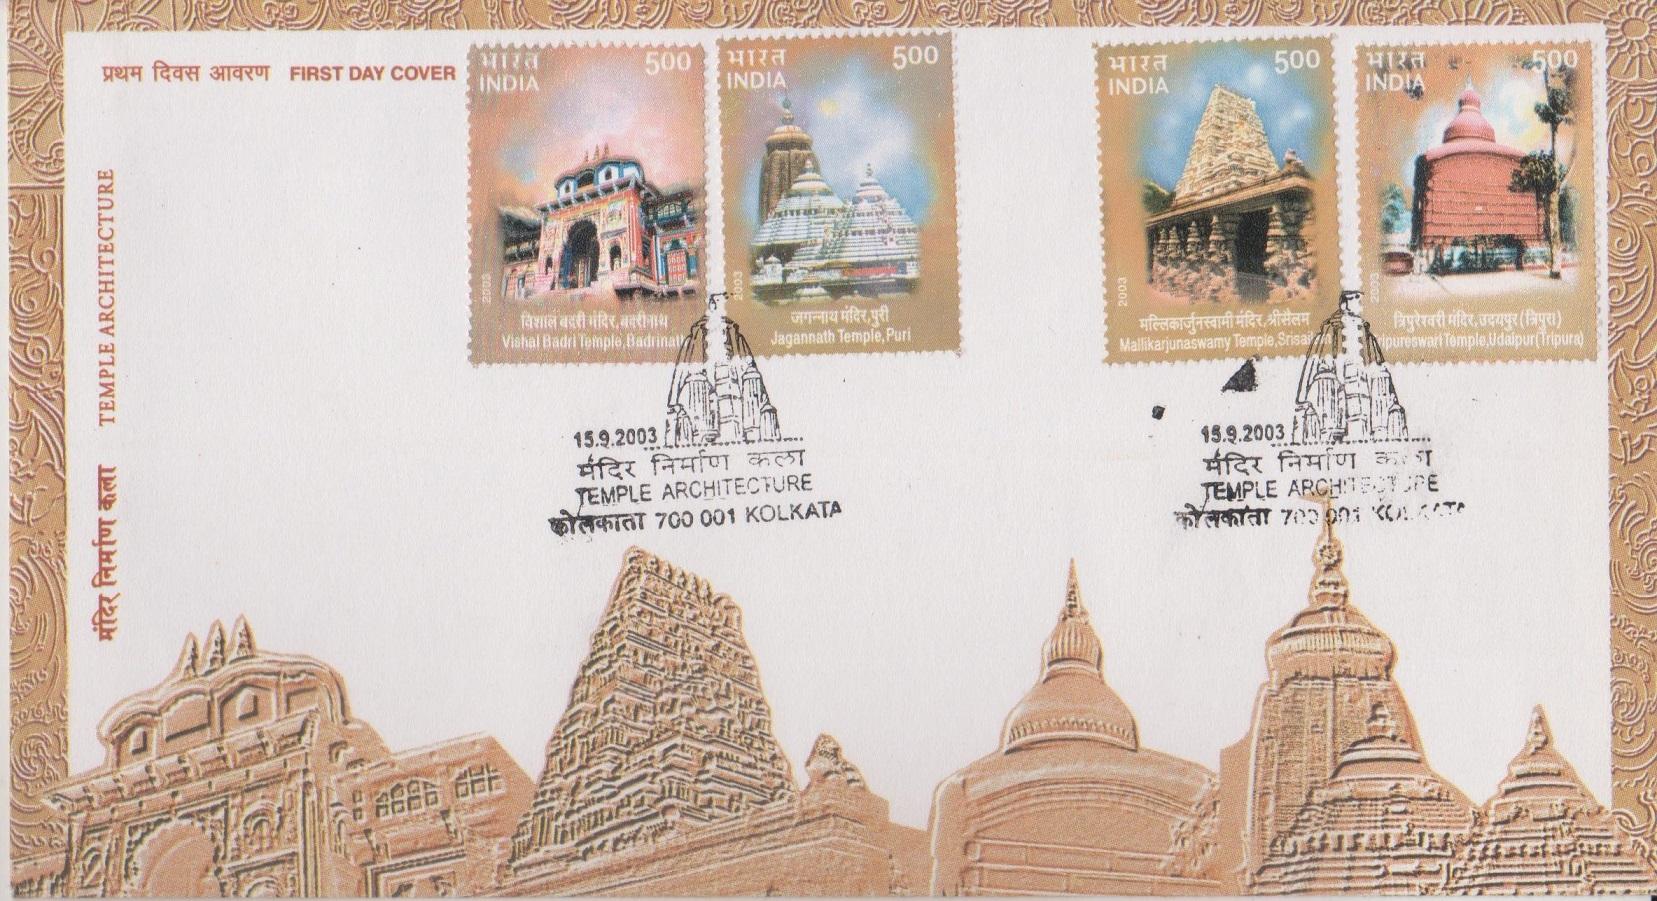 Badrinarayan, Mallikarjuna Jyotirlinga, Tripureswari & Puri Temple